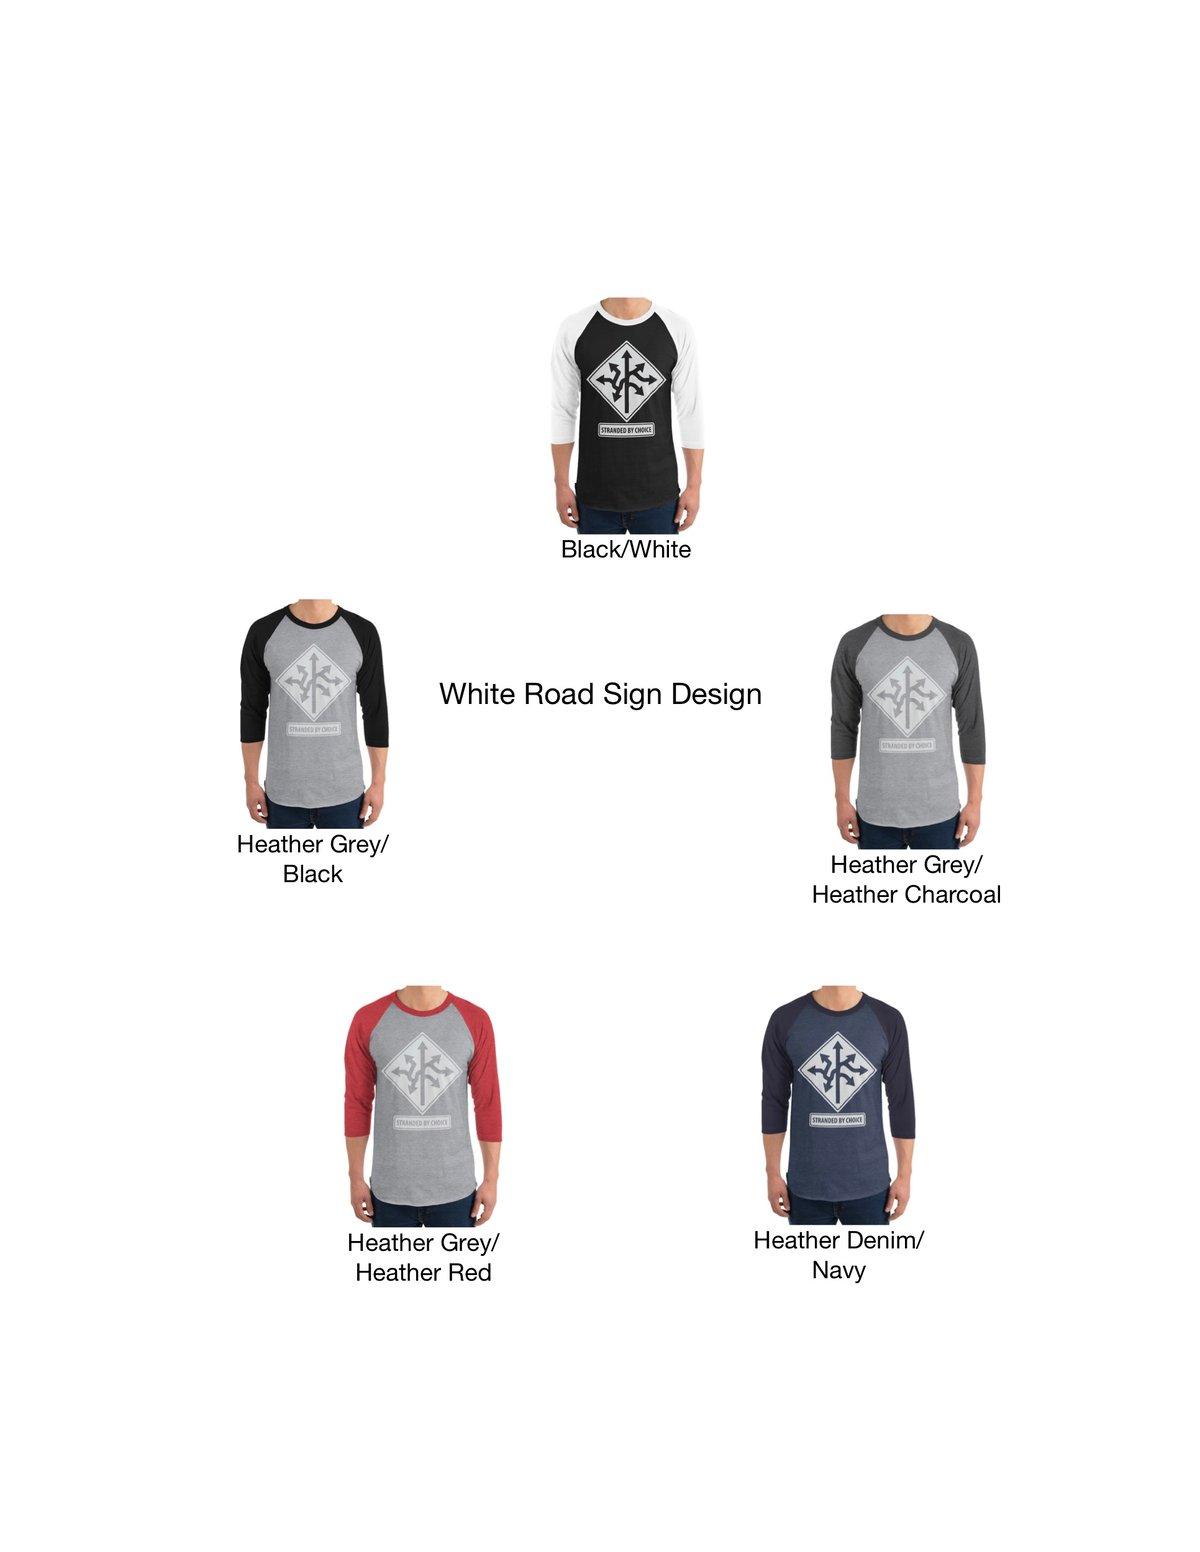 Road Sign Design 3/4 Sleeve Raglan Unisex Shirt